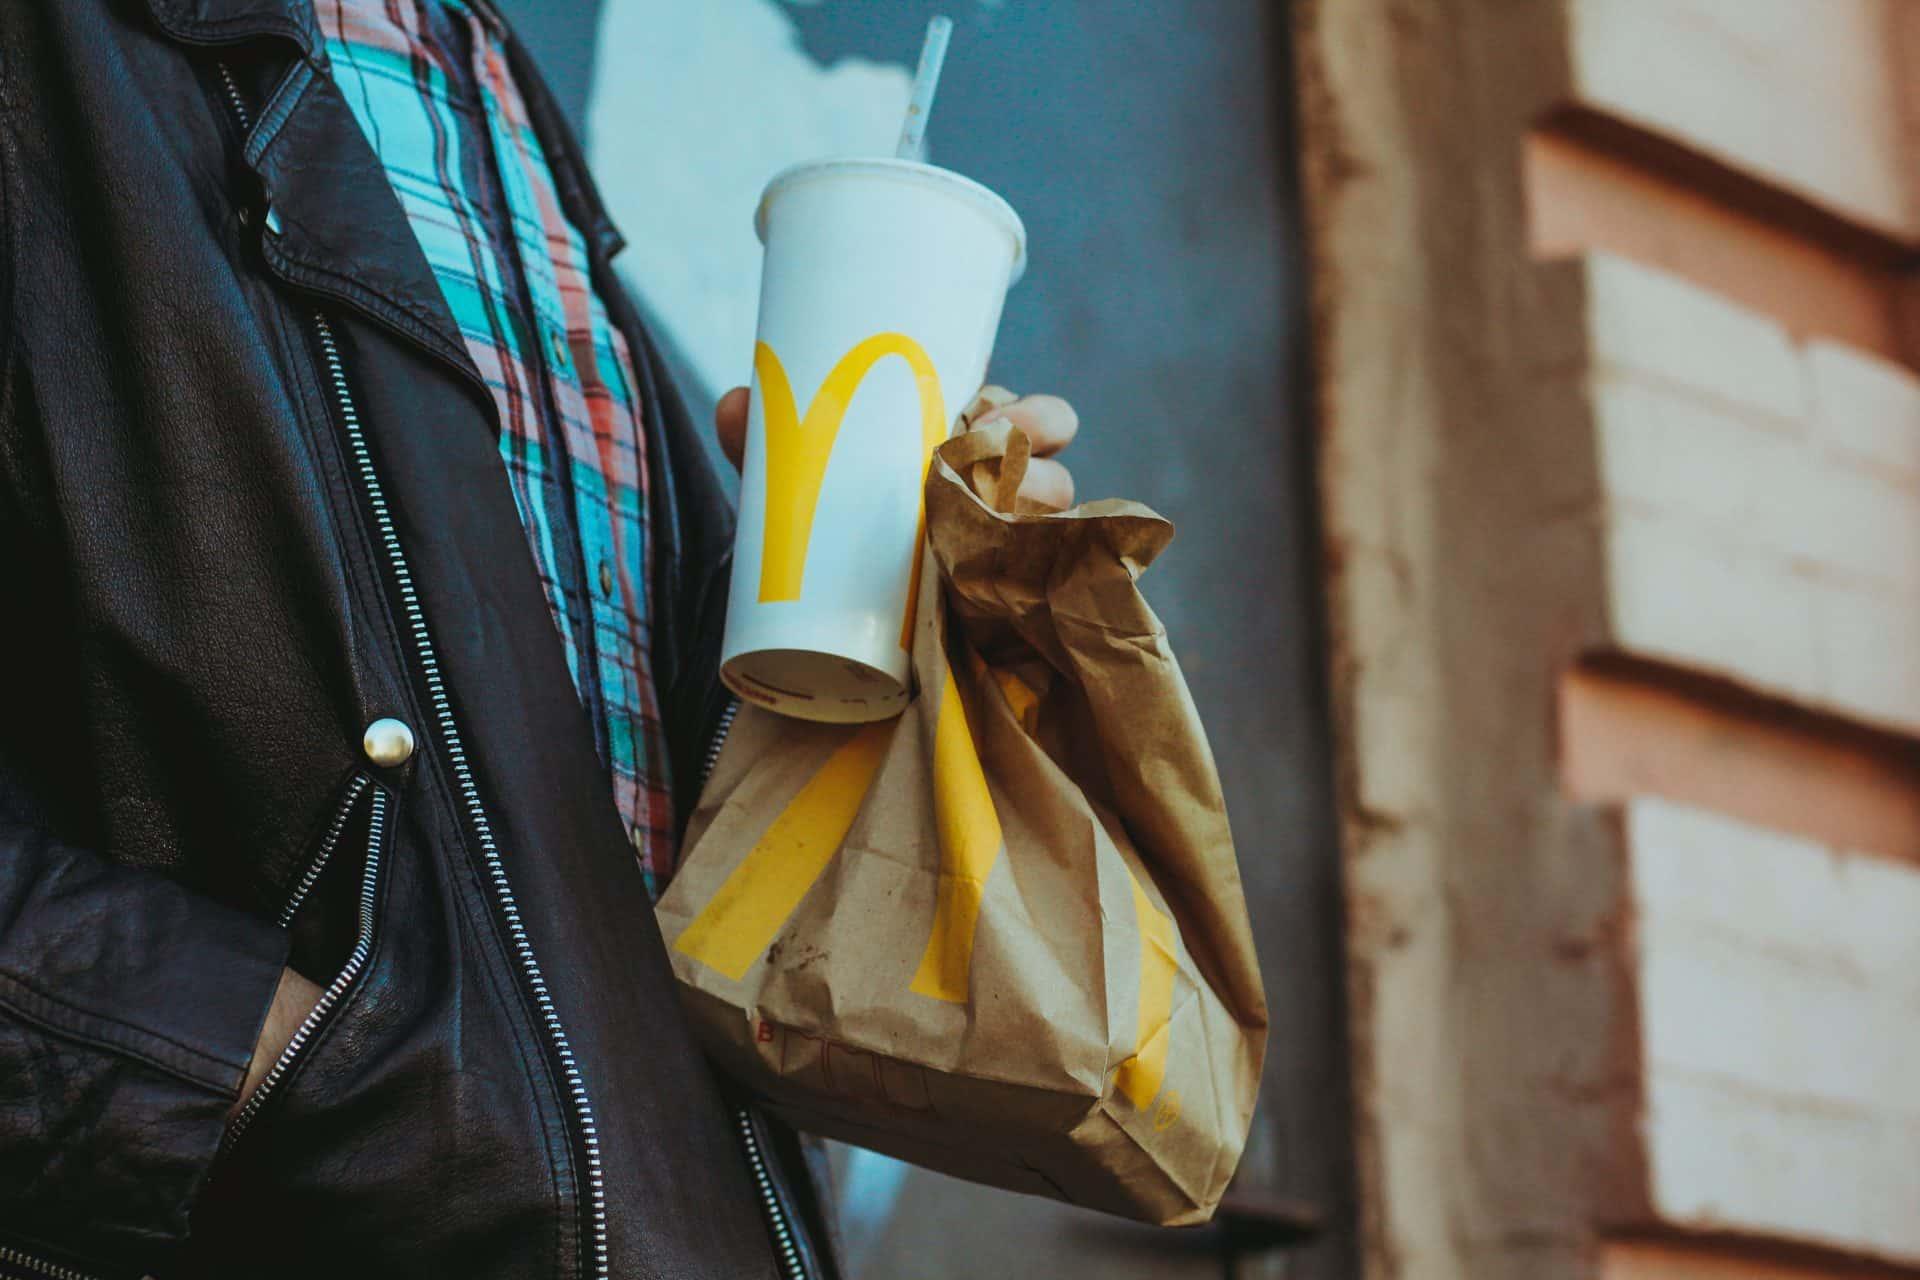 McDonalds Moscow